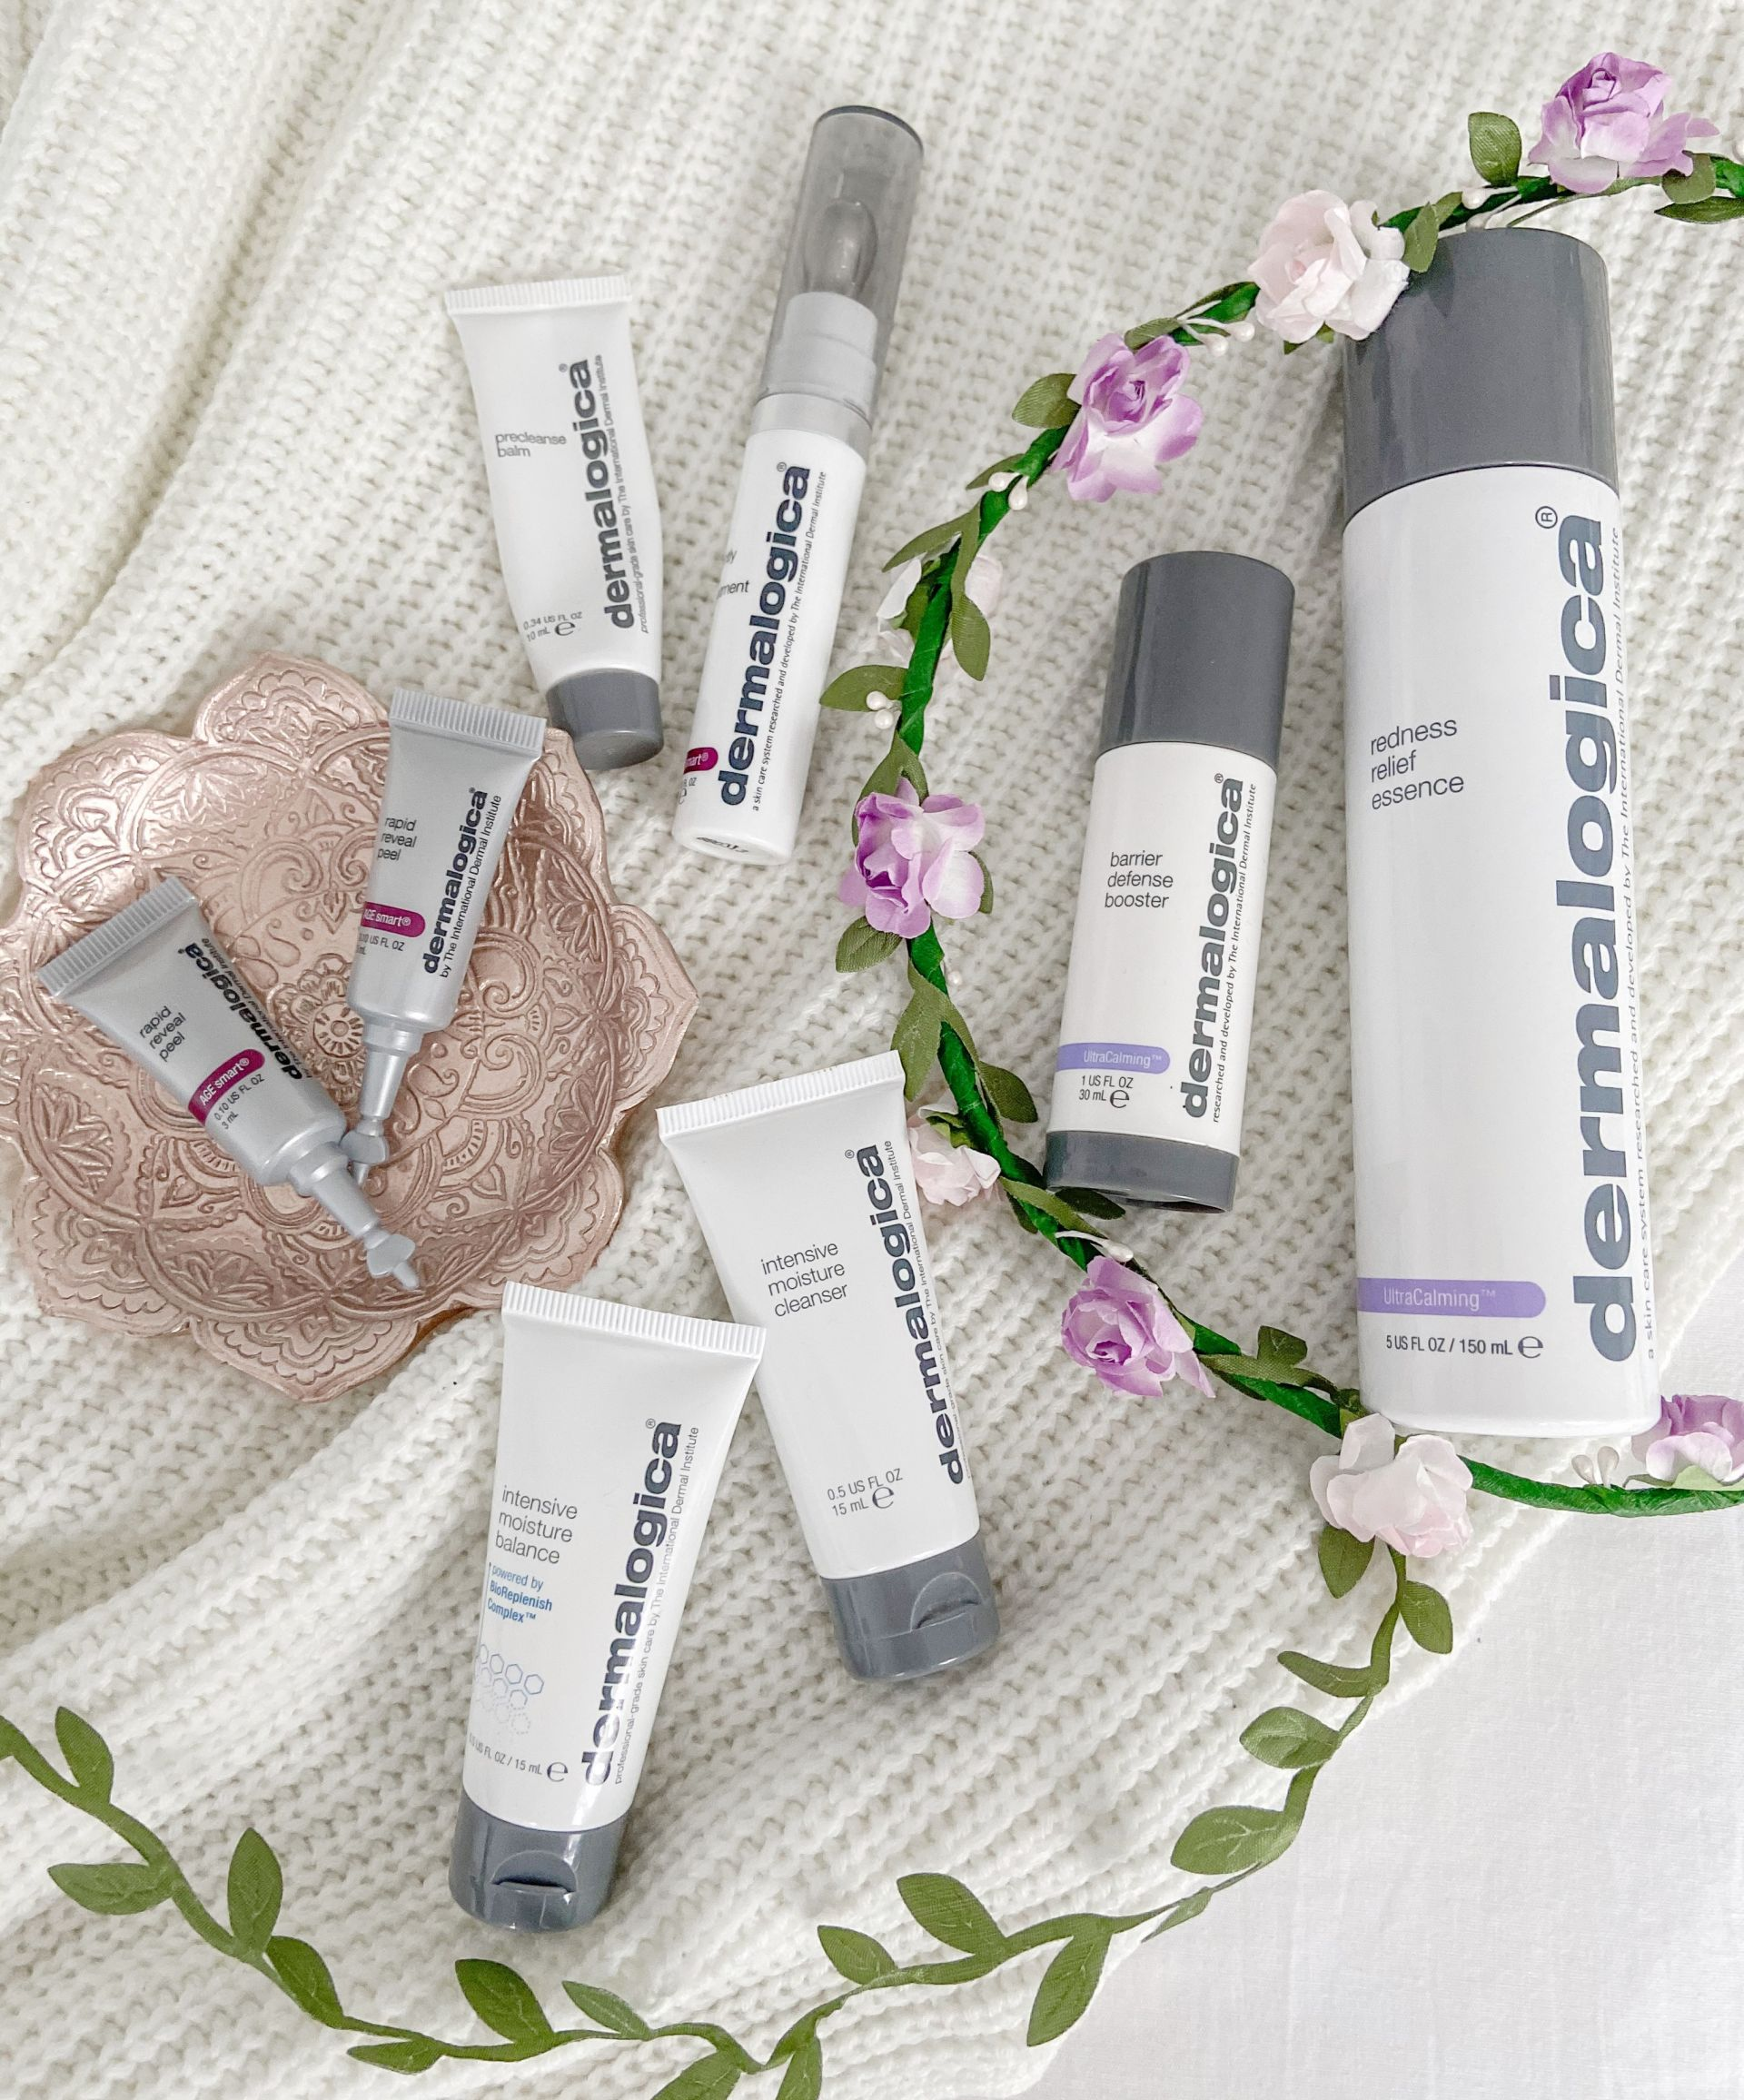 Winter Skincare Dermalogica